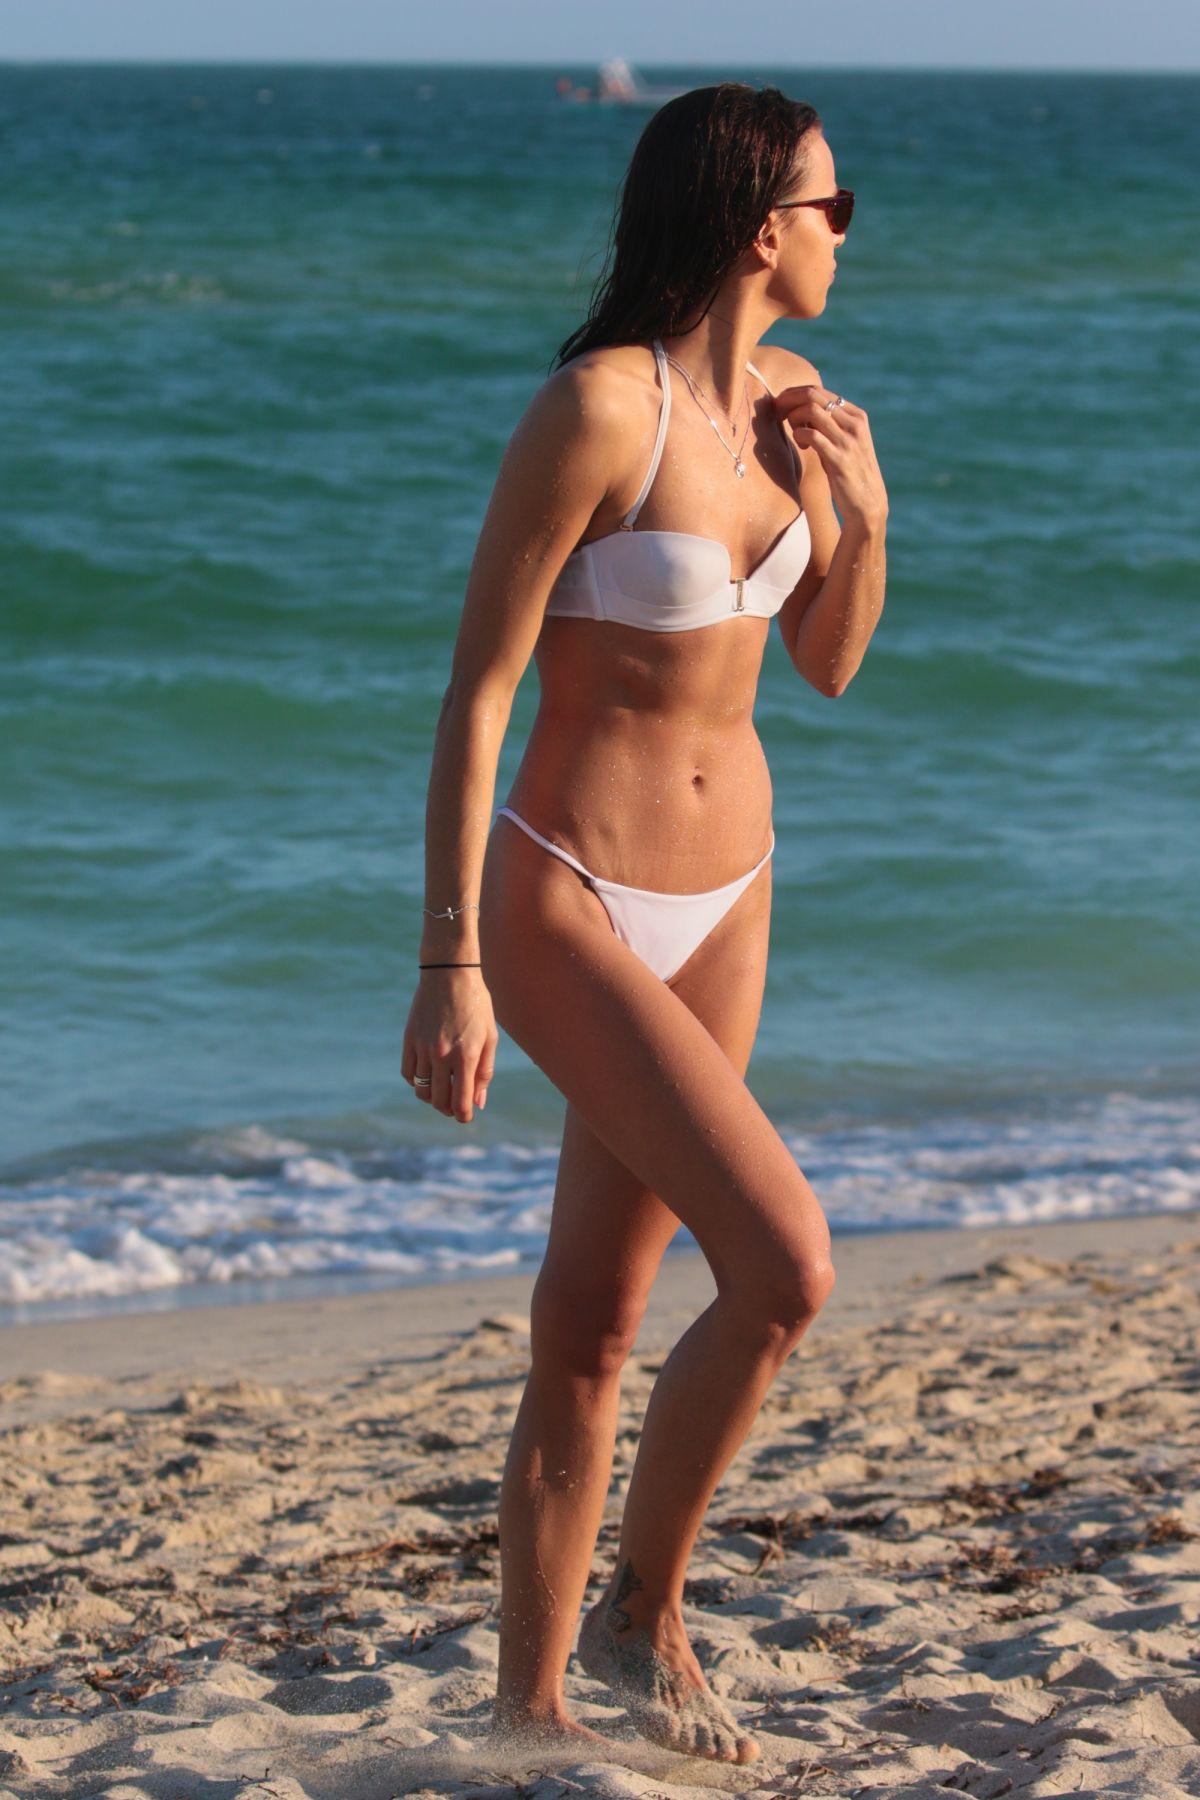 Celebrites Meri Gulin nude (23 photos), Tits, Sideboobs, Instagram, braless 2018